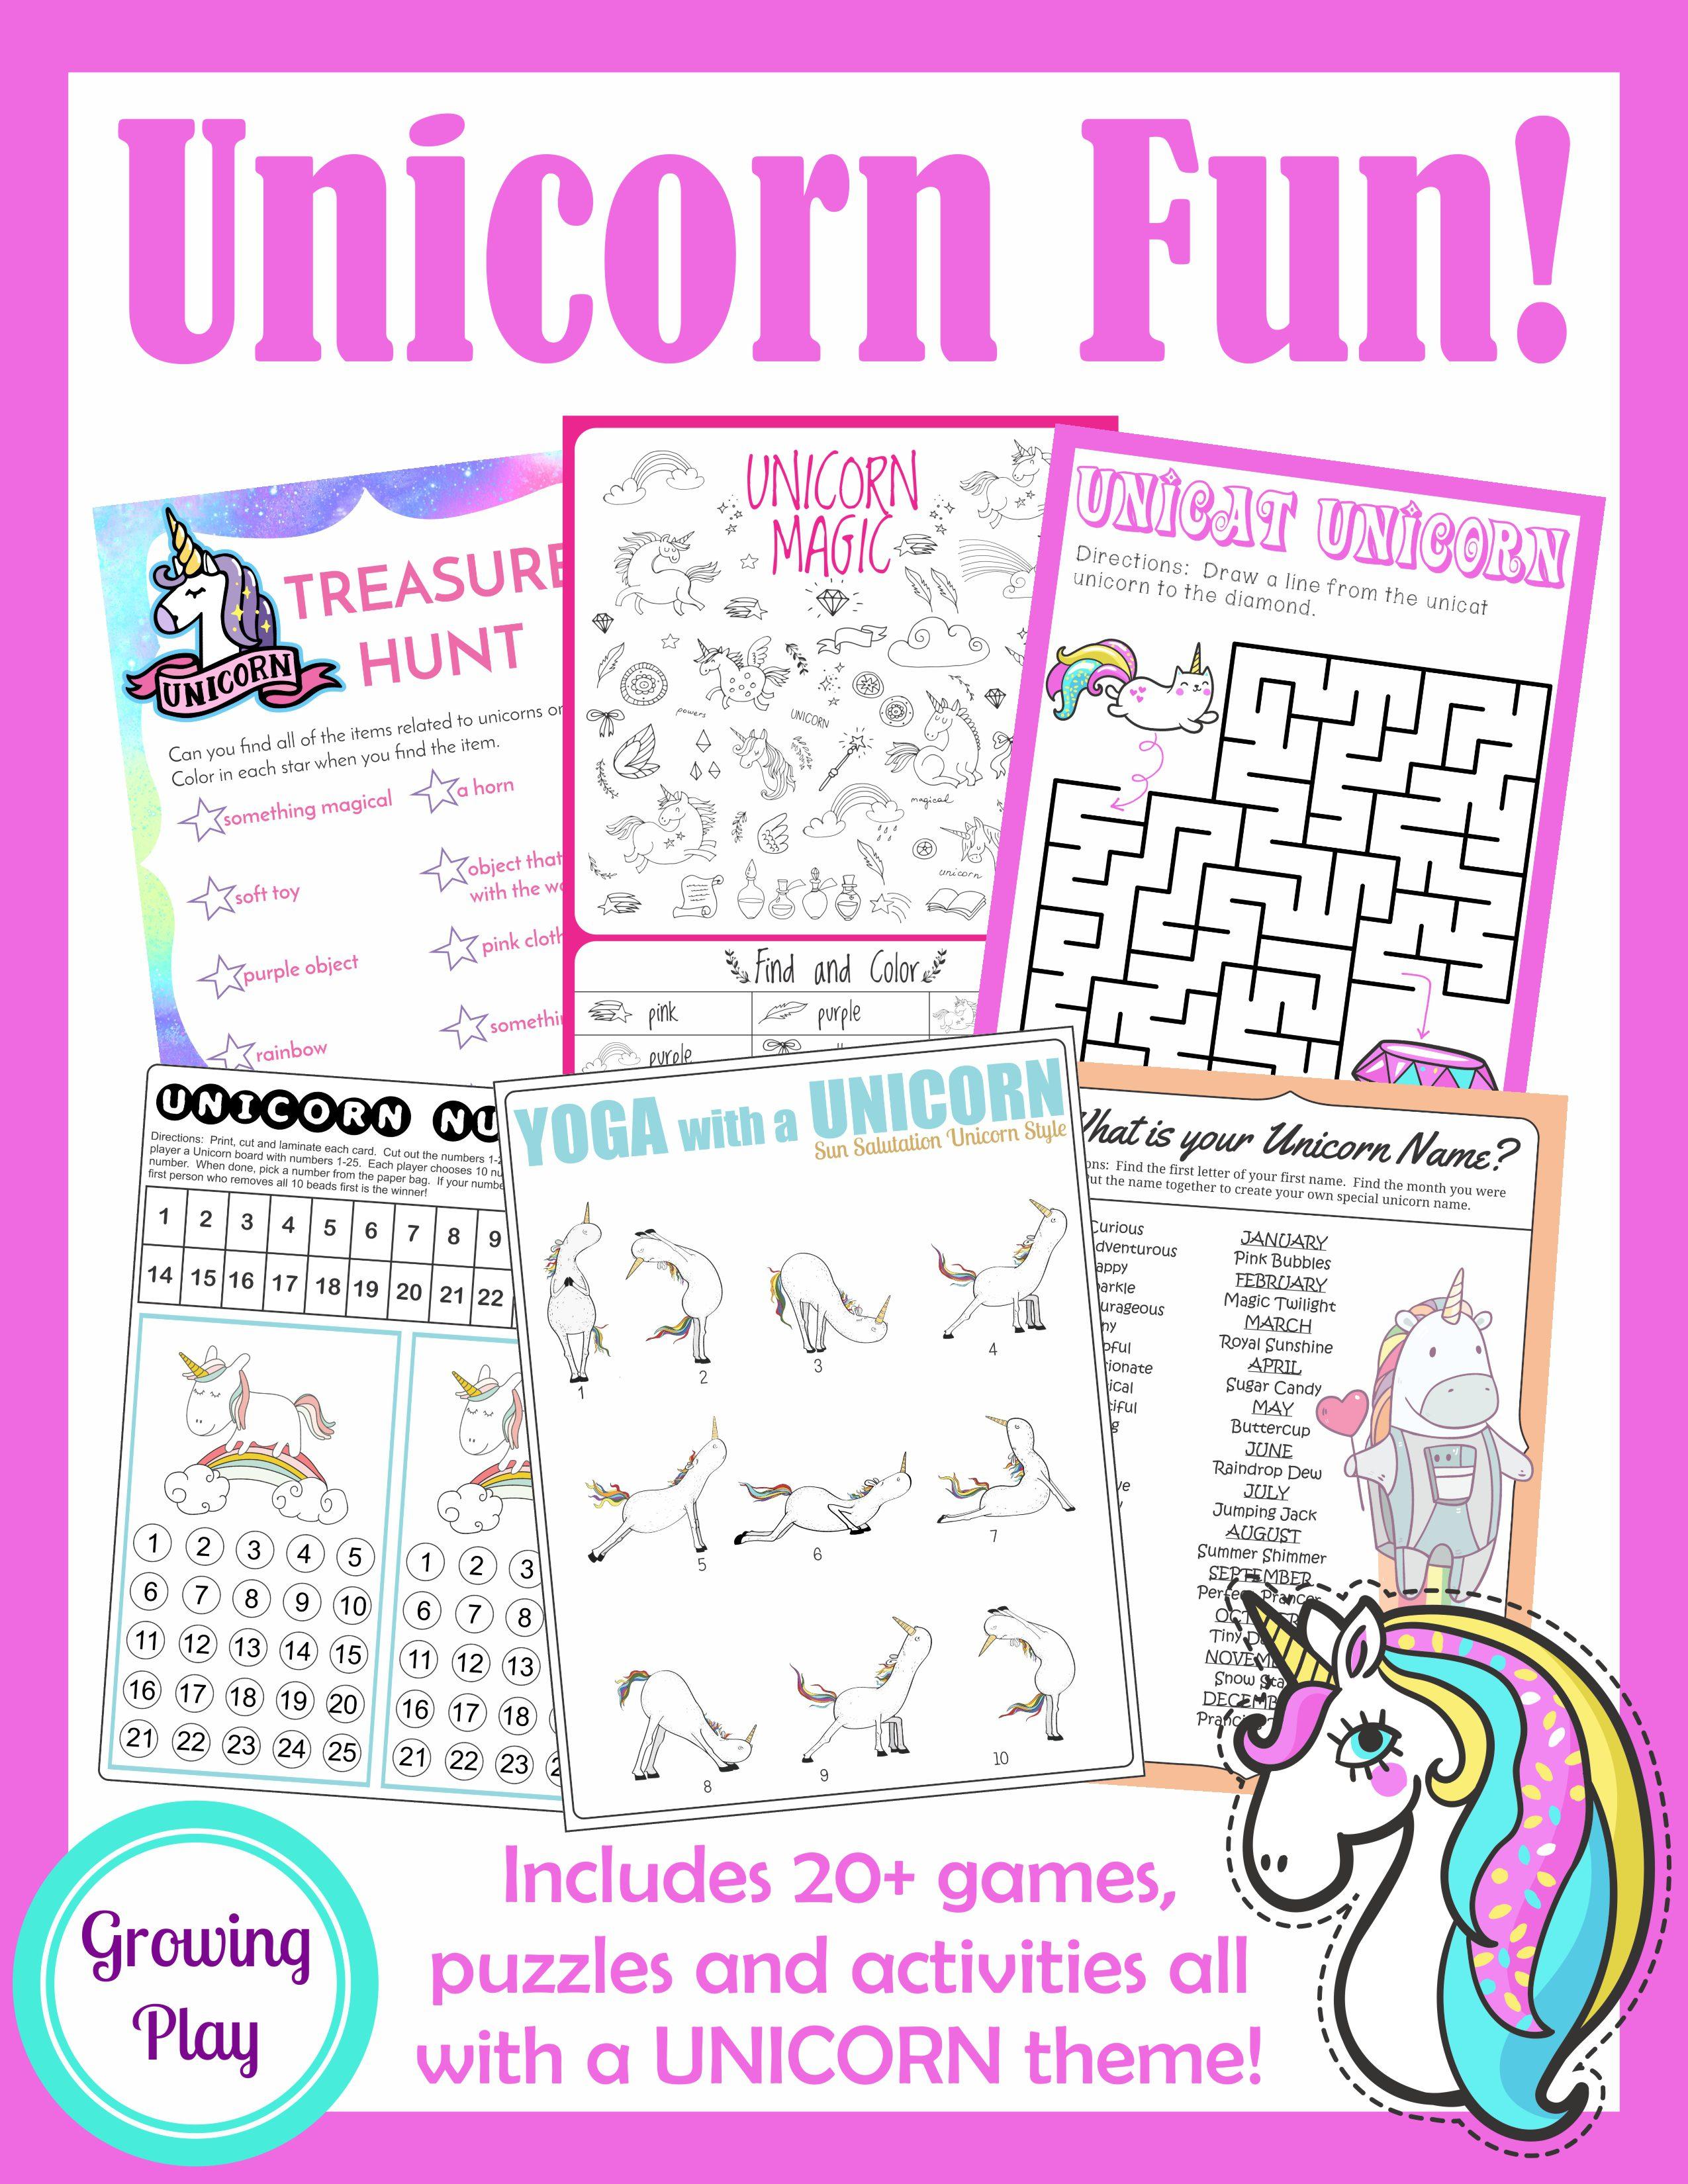 Unicorn Birthday Games Activities Puzzles on Letter U Maze Printable